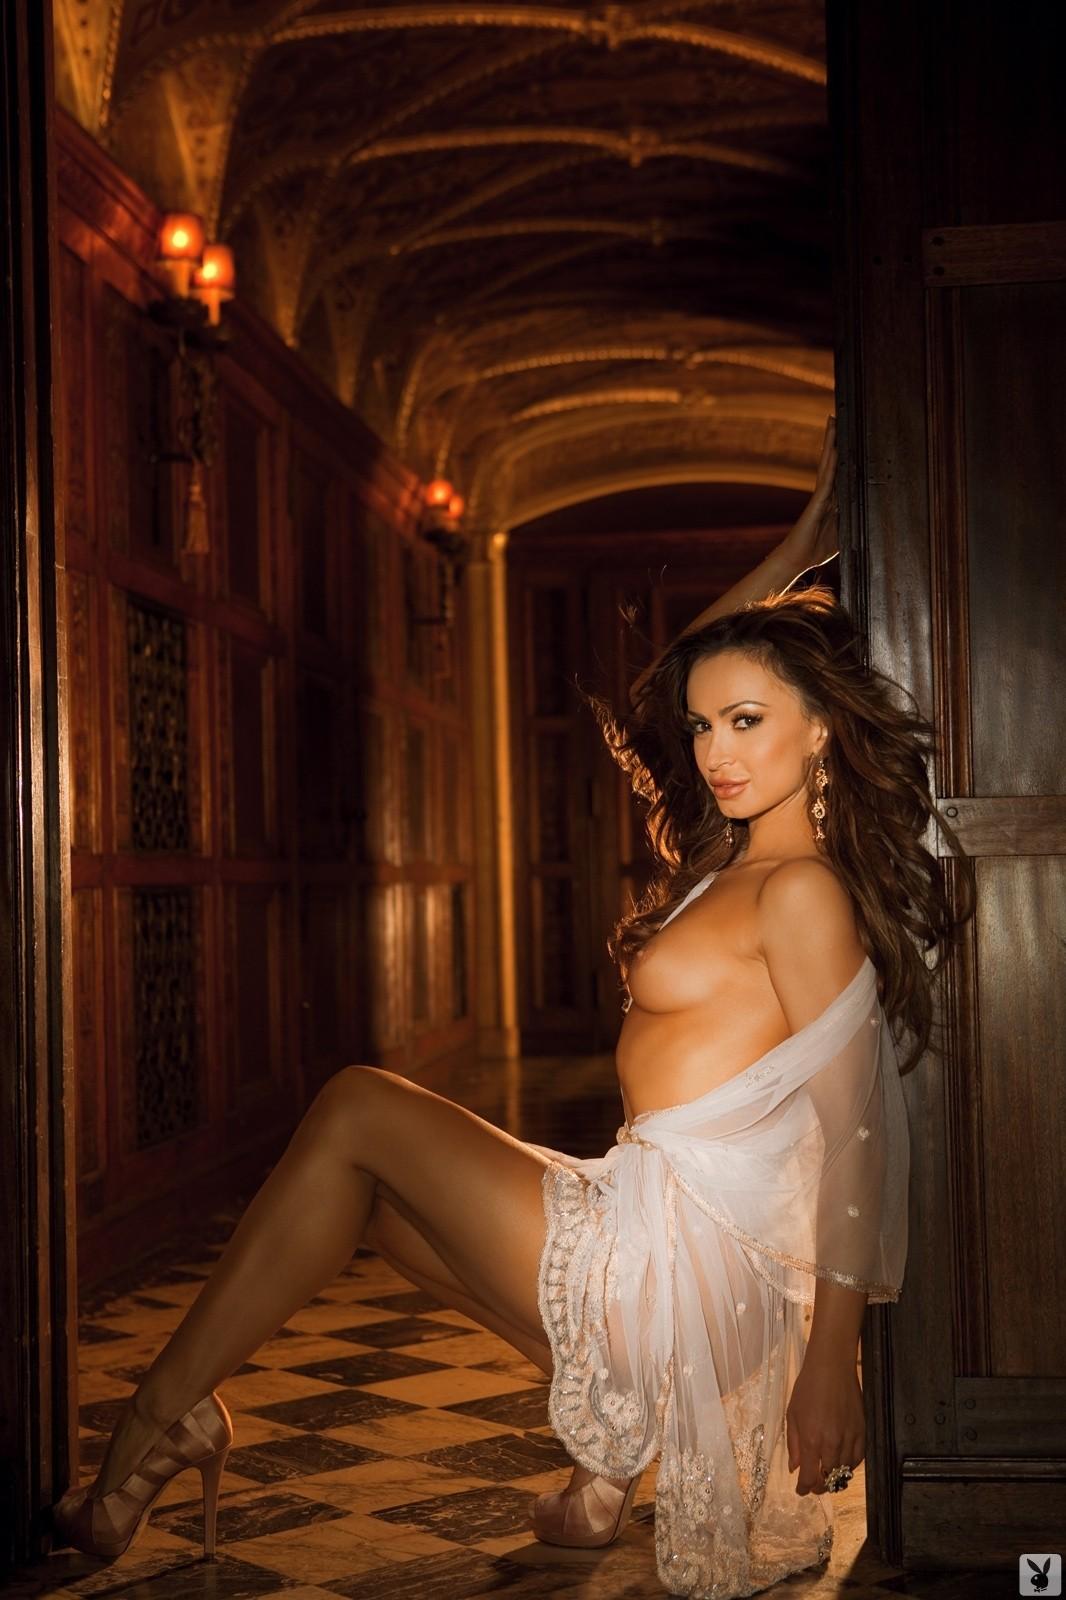 karina smirnoff naked movie